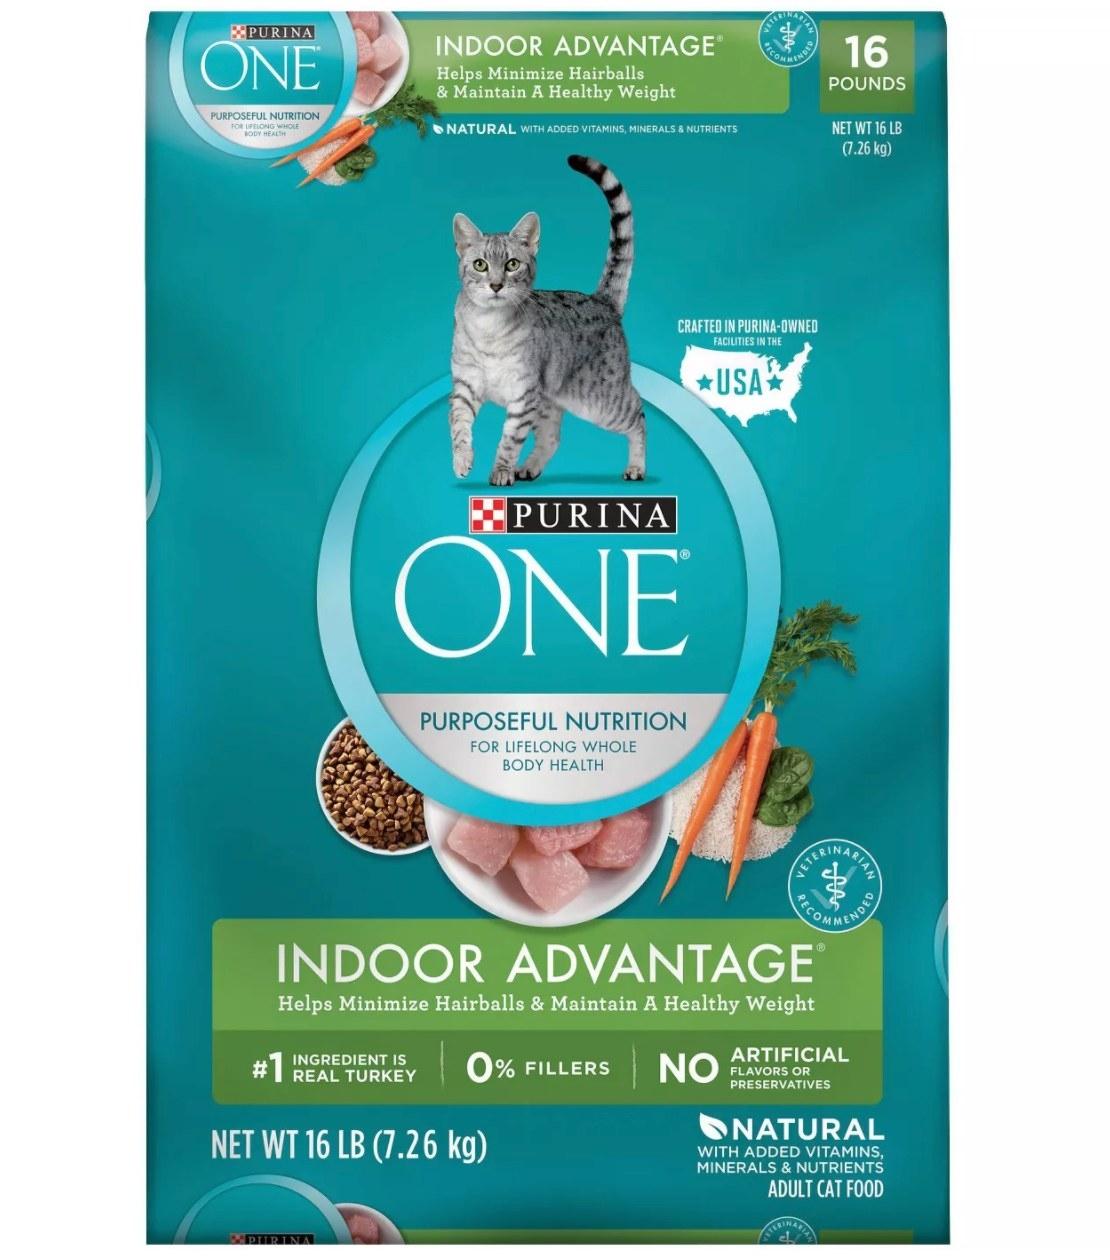 Bag of Purina One Indoor Advantage Cat Food